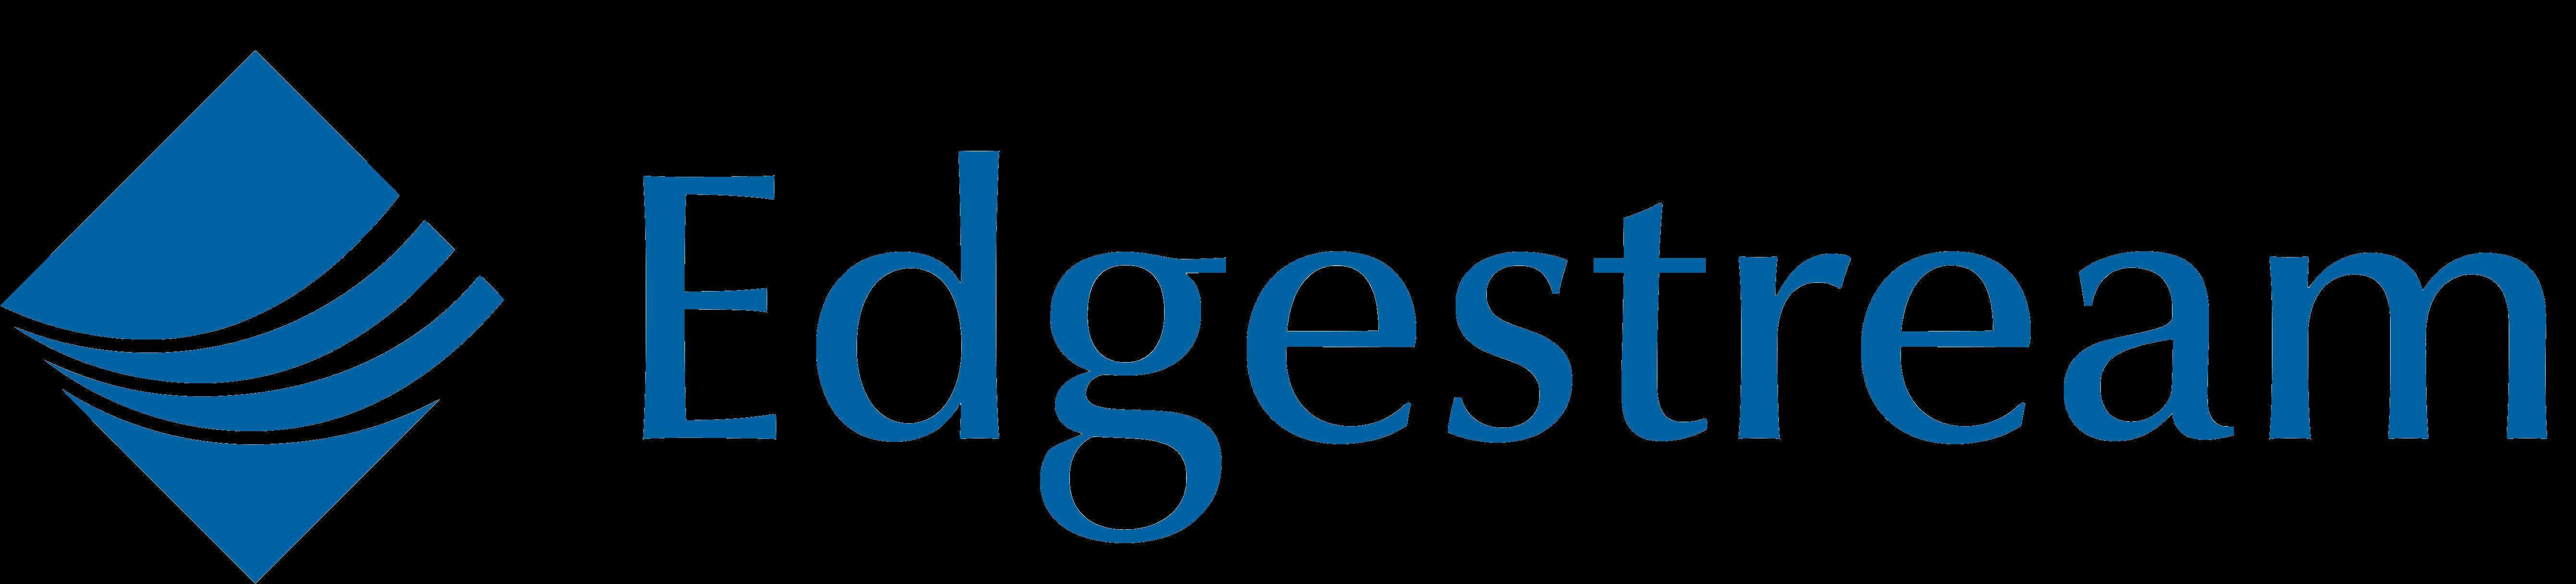 Edgestream logo